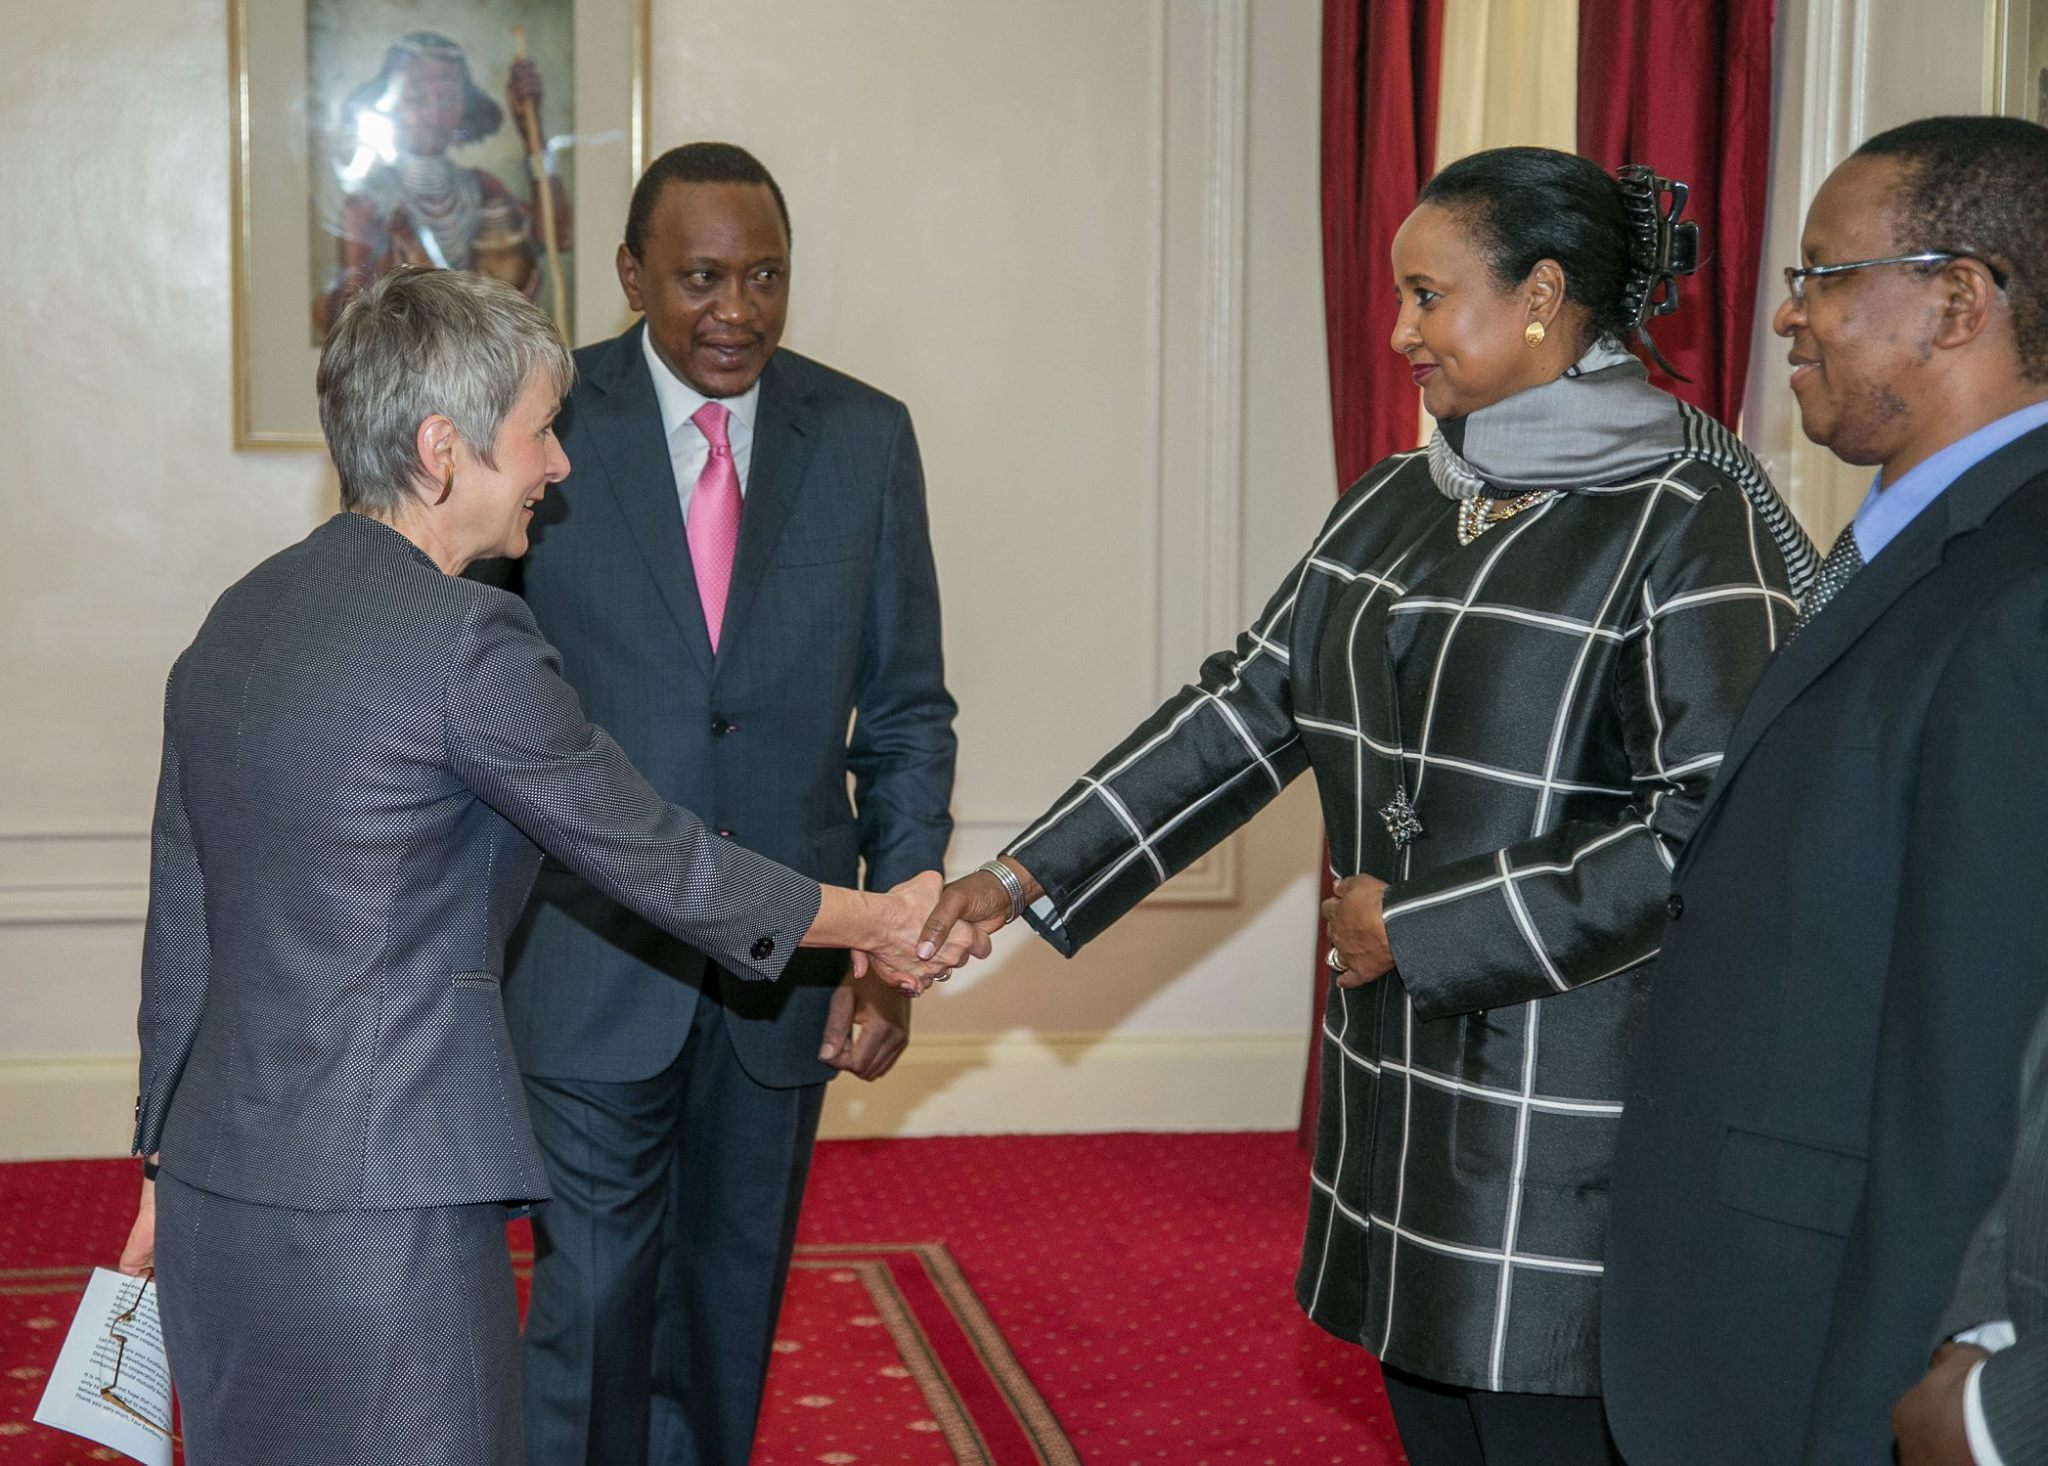 Uhuru Kenyatta, Jutta Frasch, Amina Mohammed, Karanja Kibicho